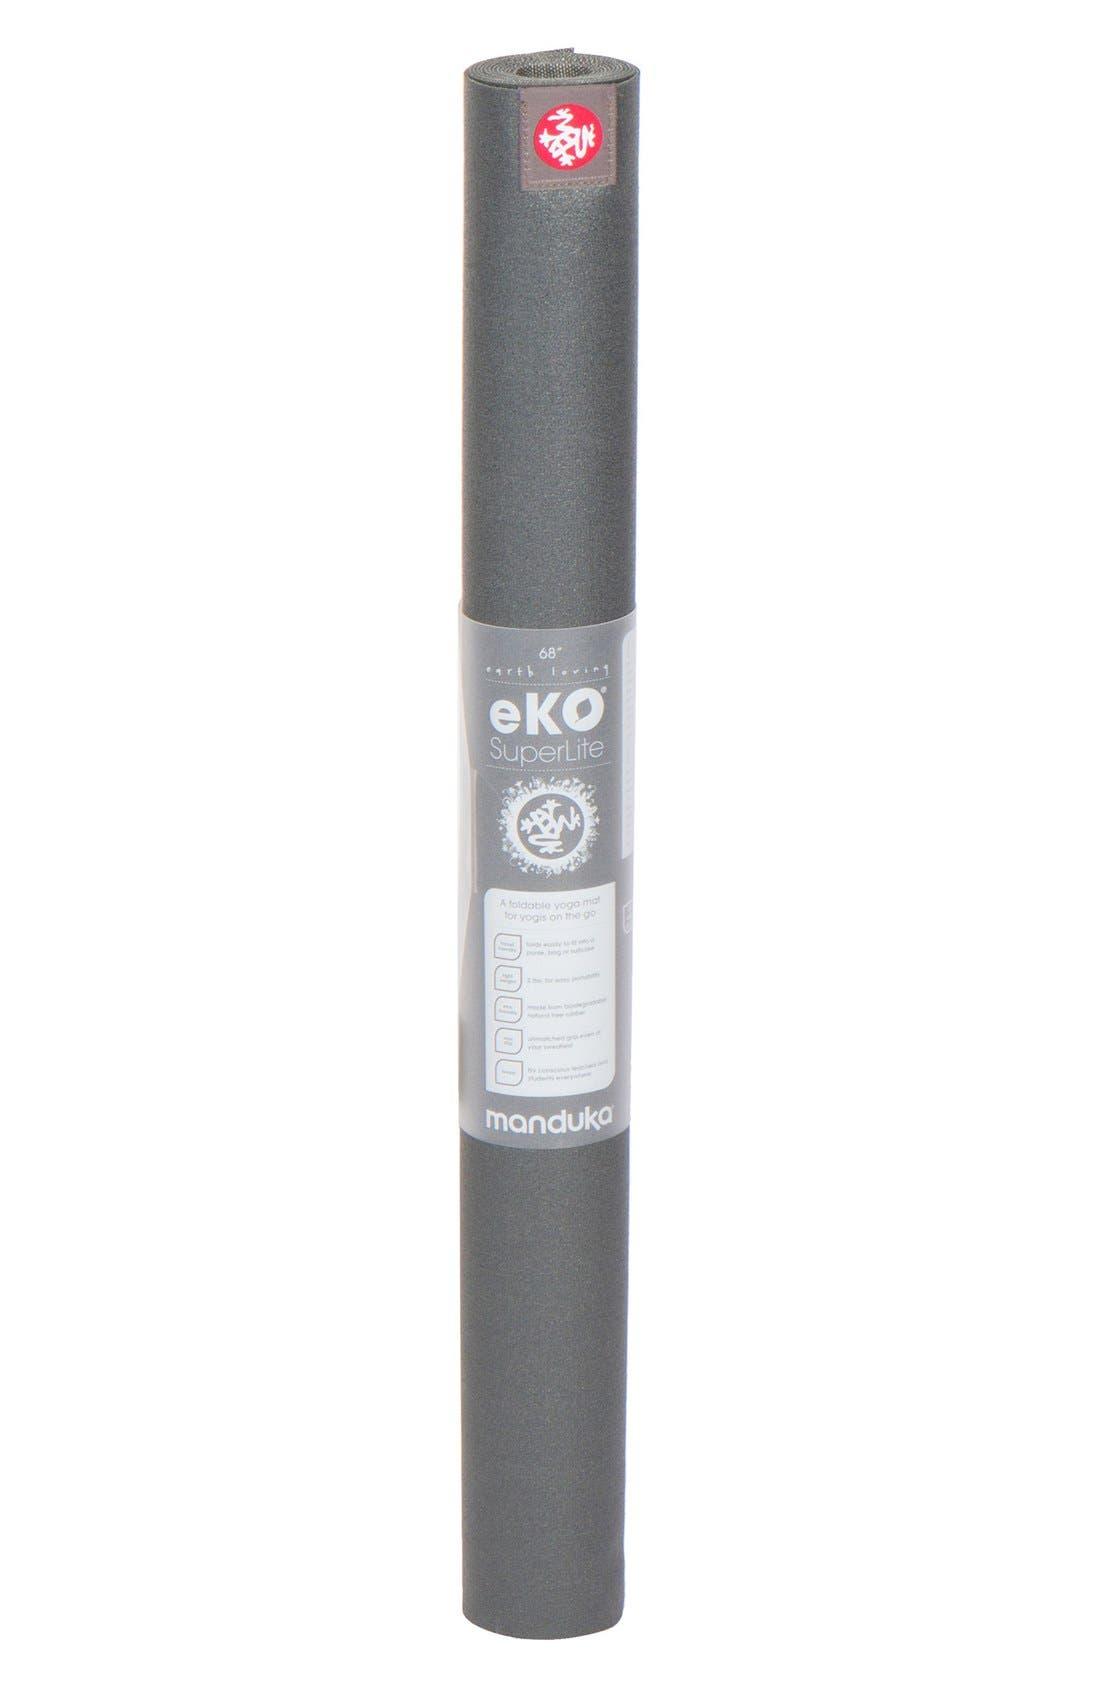 Alternate Image 1 Selected - Manduka 'eKO SuperLite' Travel Yoga Mat